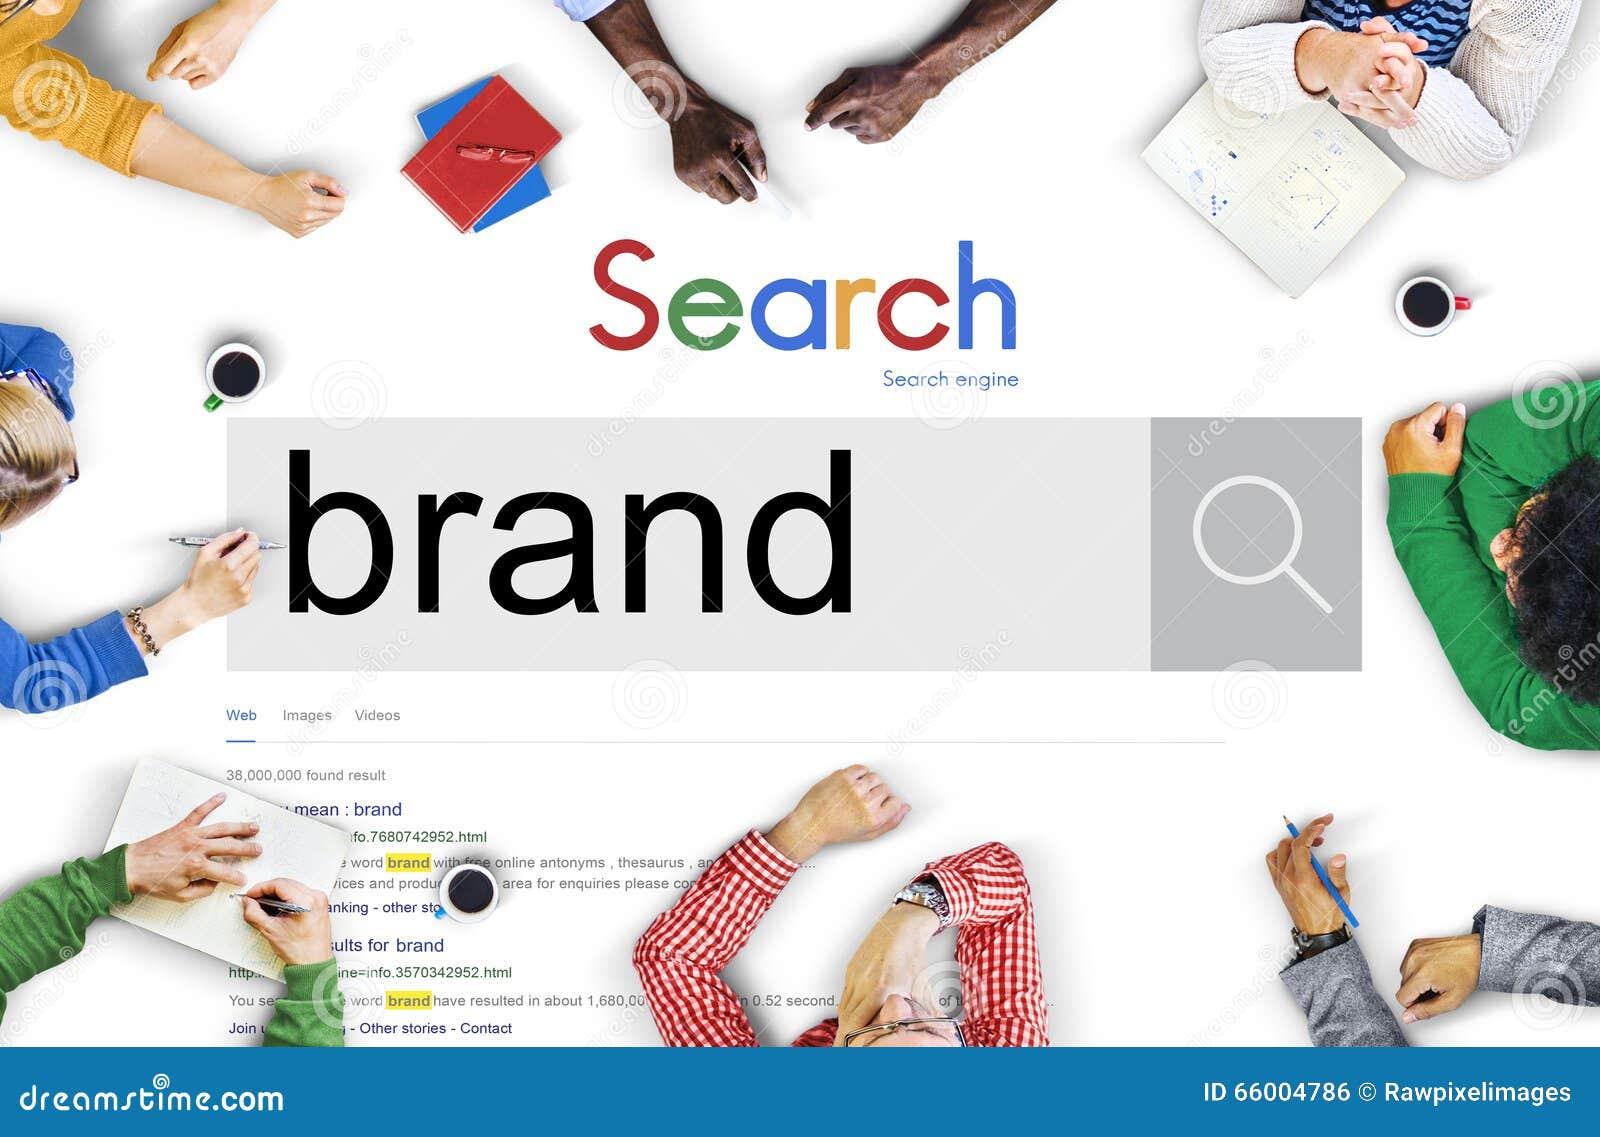 Brand Branding Marketing Advertising Trademark Concept Stock Photo - Image of concept, browsing: 66004786 - 웹